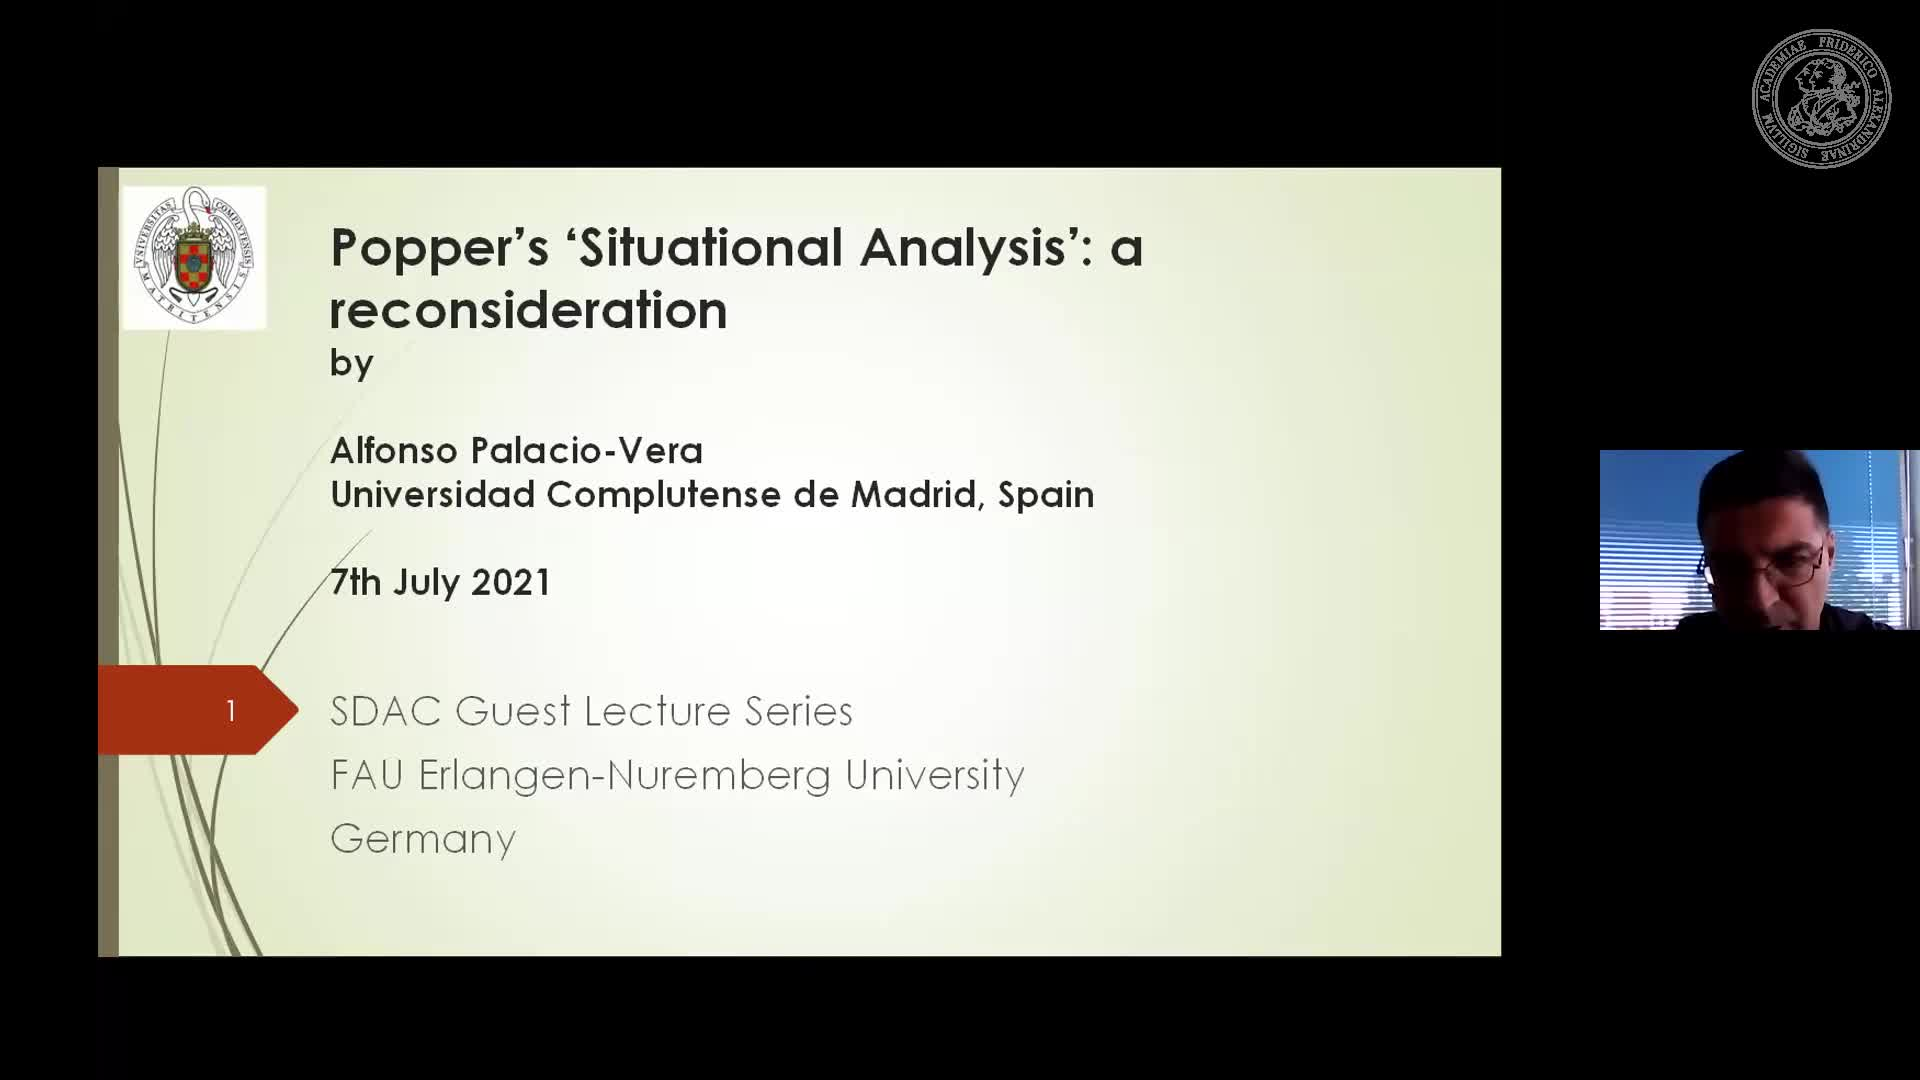 Alfonso Palacio-Vera (Complutense University of Madrid):